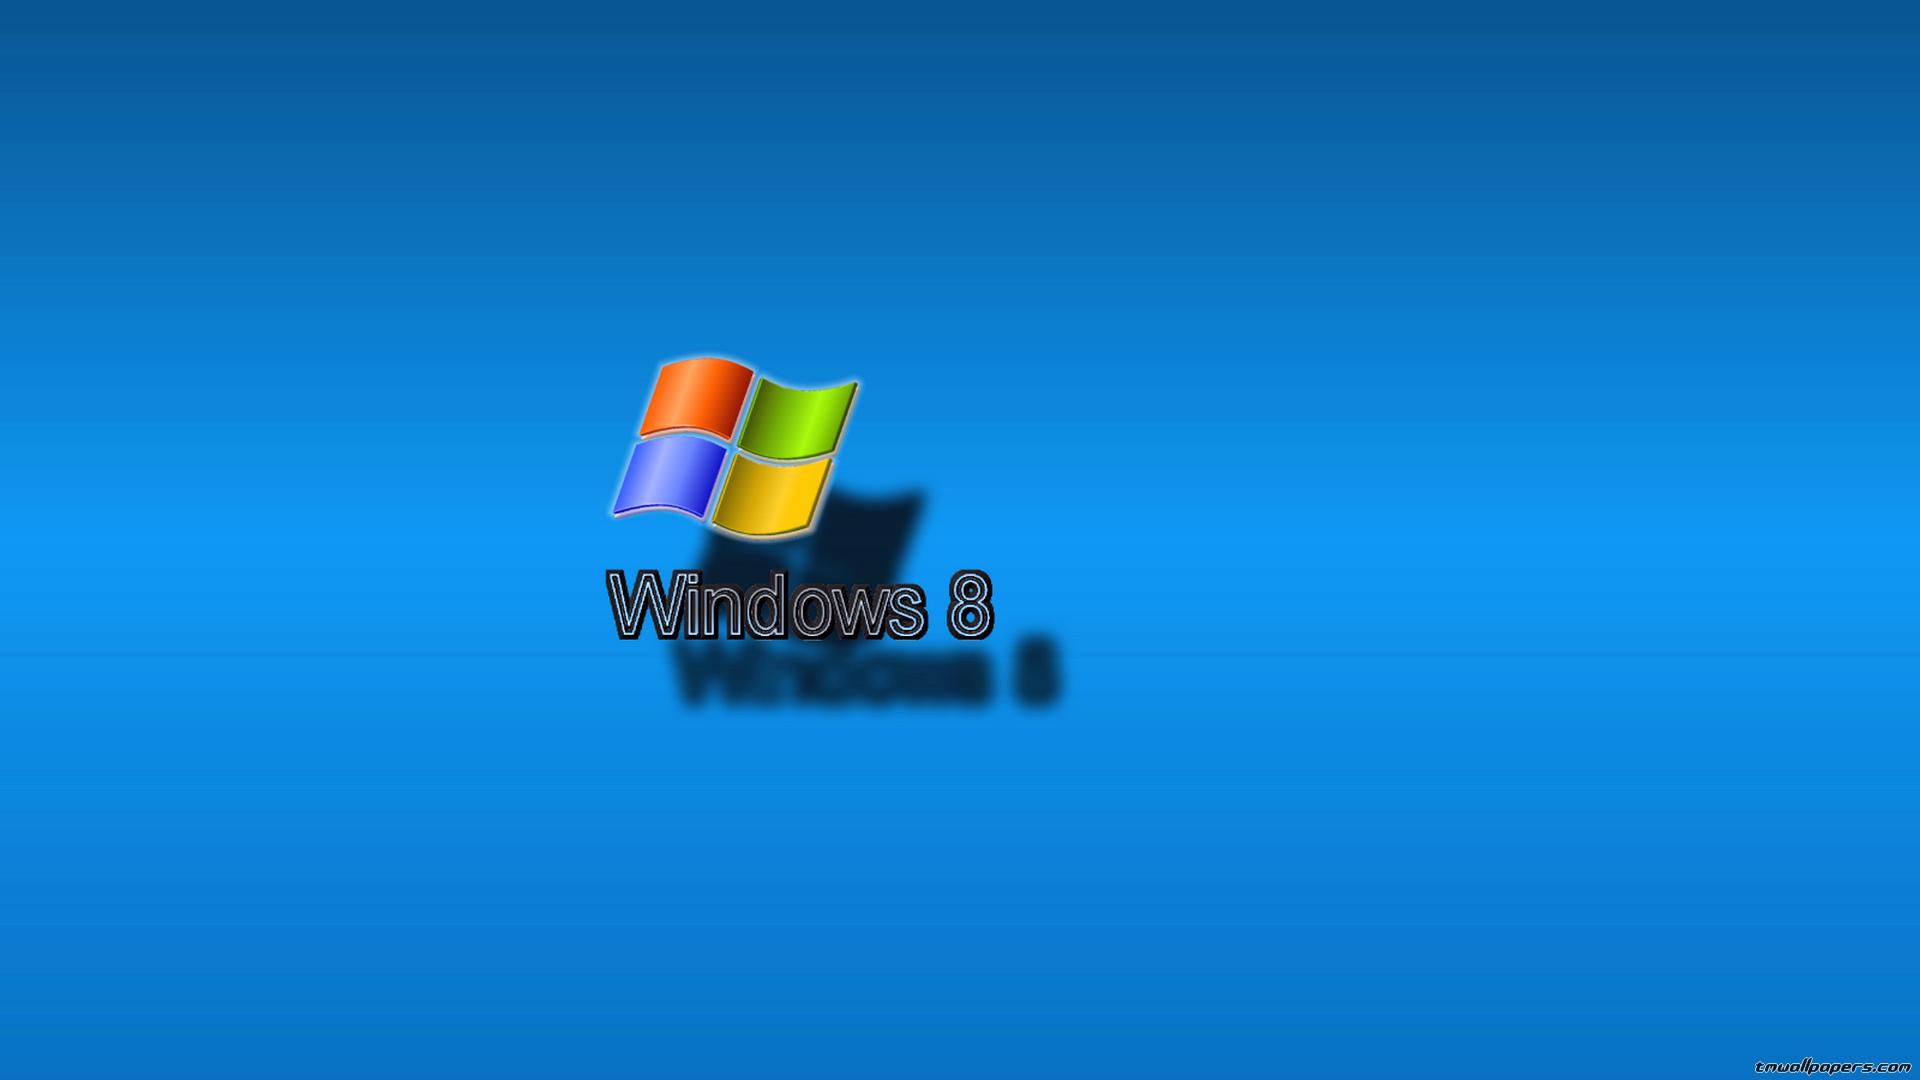 windows wallpaper 1920x1080 windows 8 1 wallpaper 1920x1080 windows 1920x1080